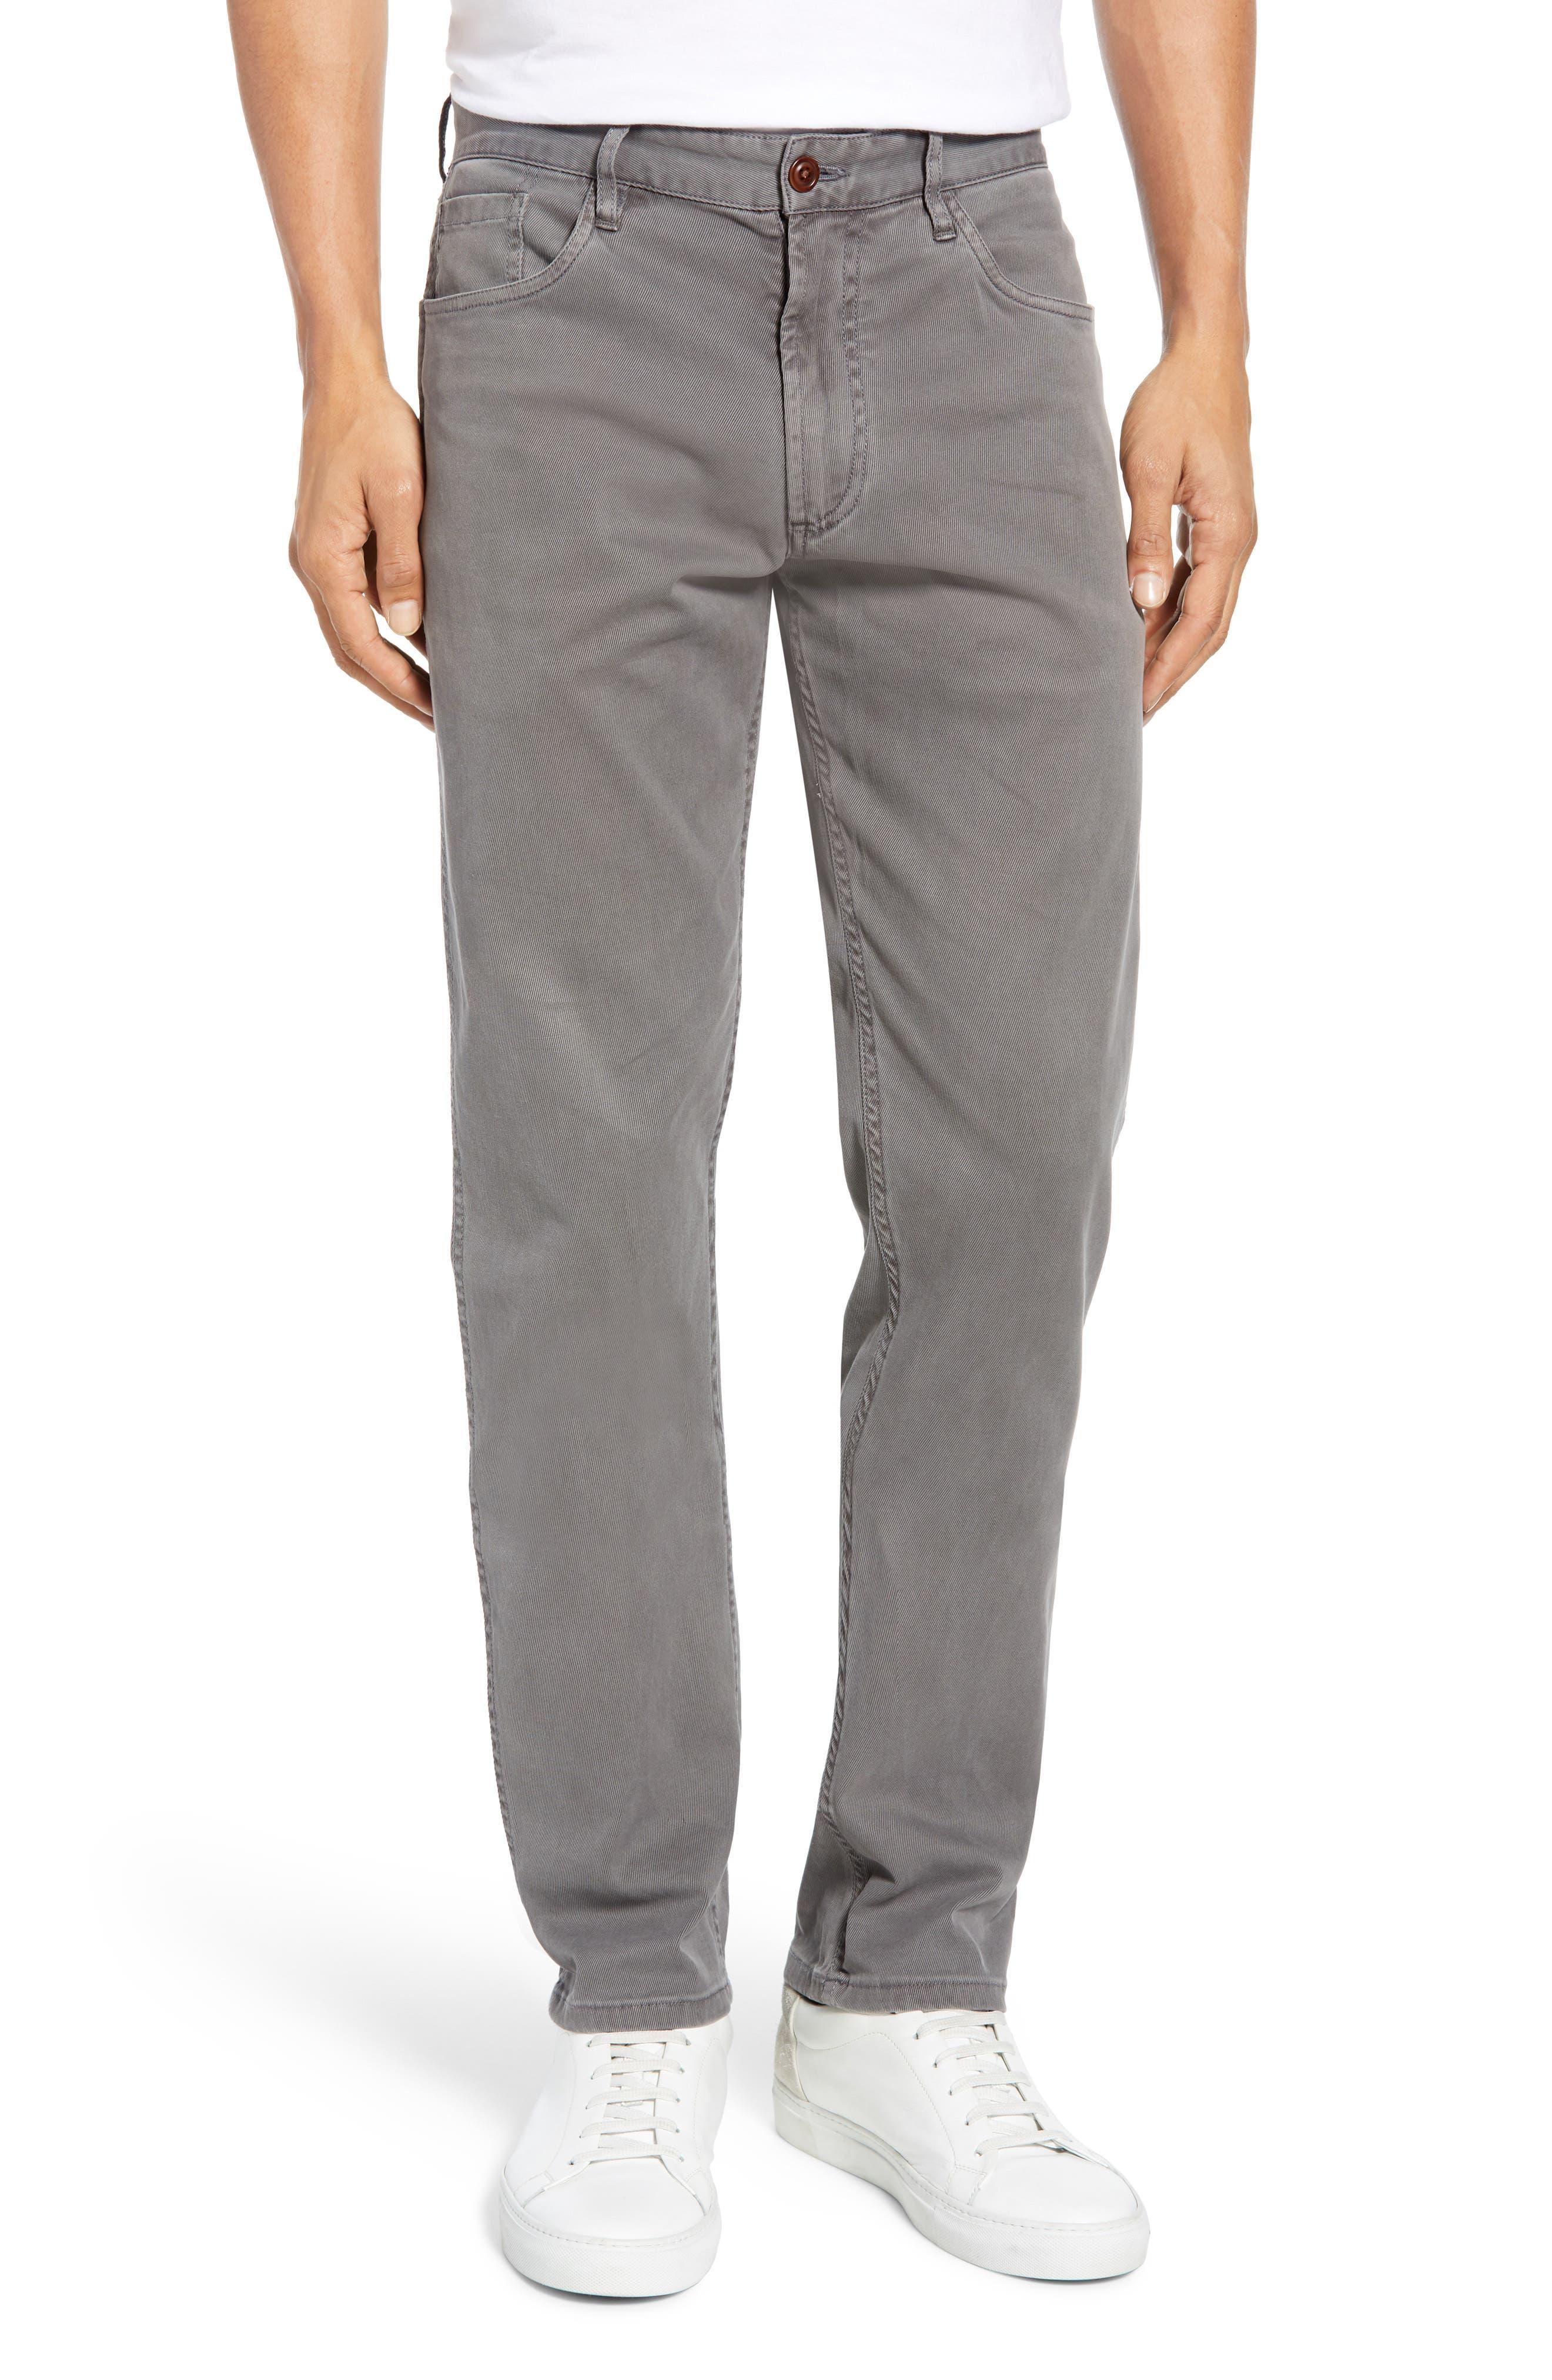 Faherty Comfort Twill Straight Leg 5-Pocket Pants, Grey